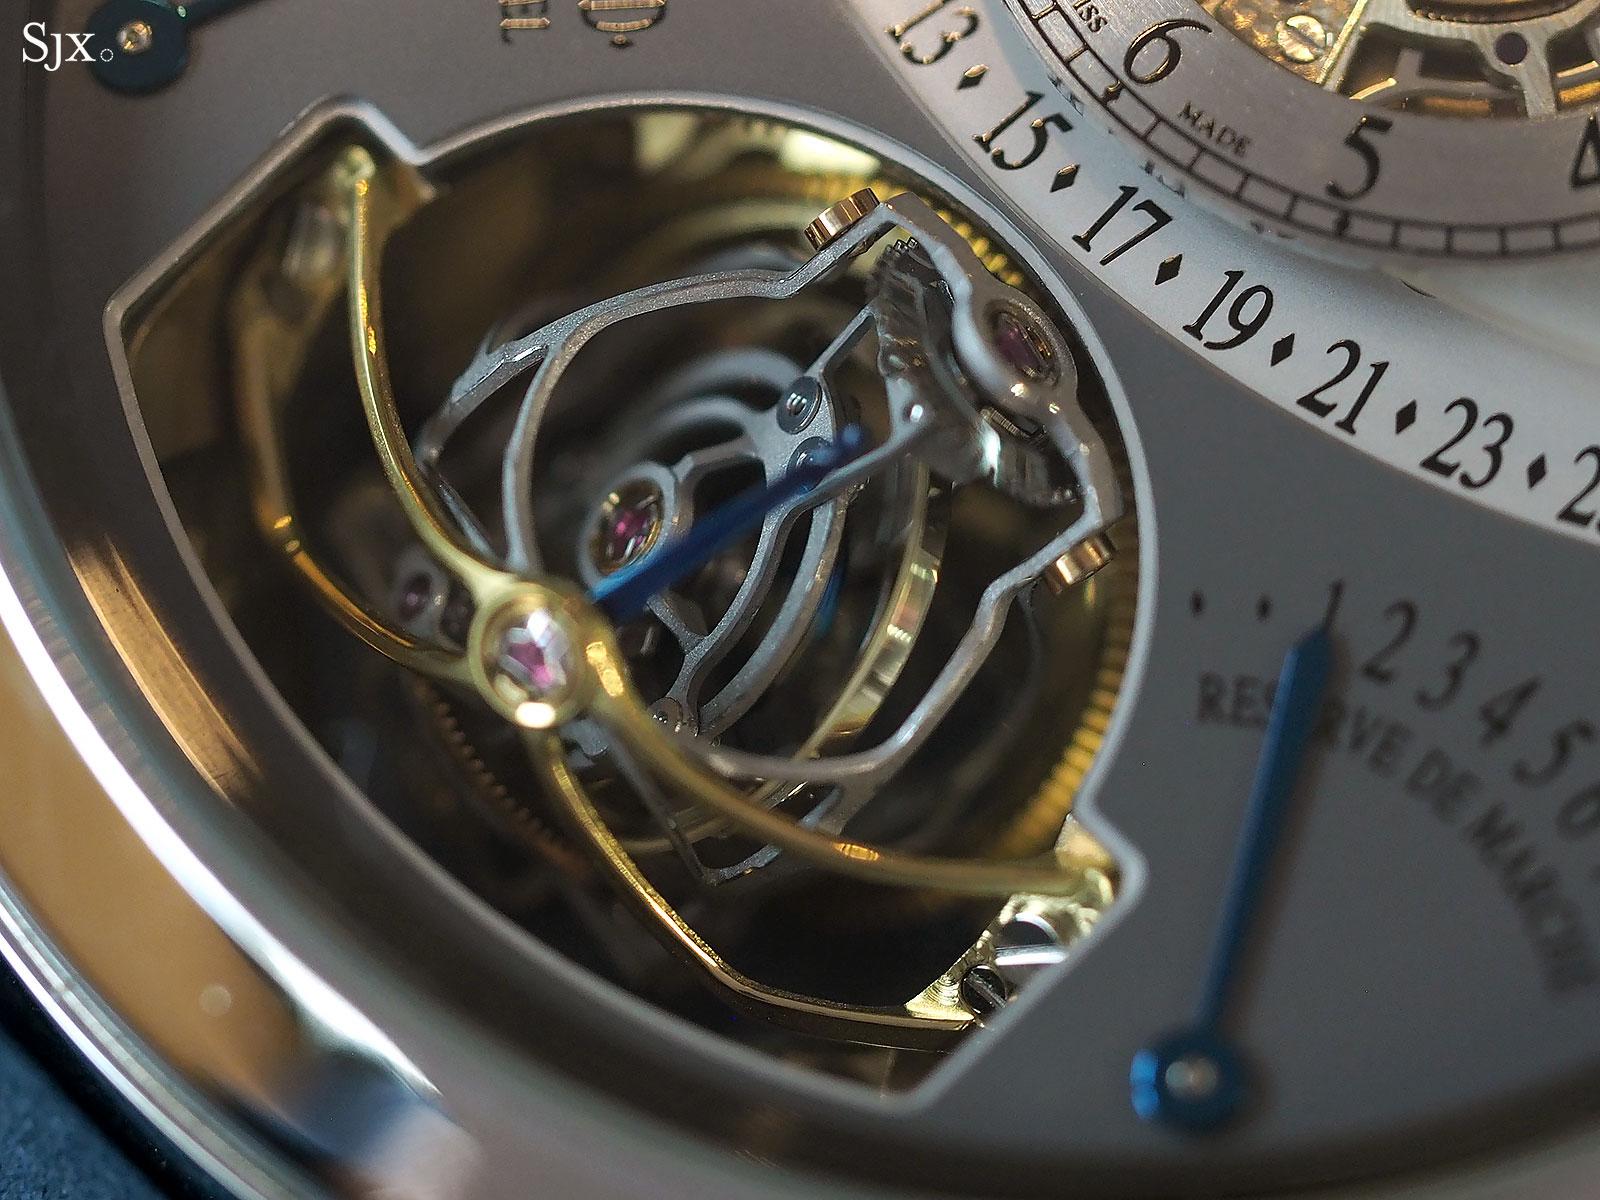 Jaeger-LeCoultre Gyrotourbillon 1 platinum 2